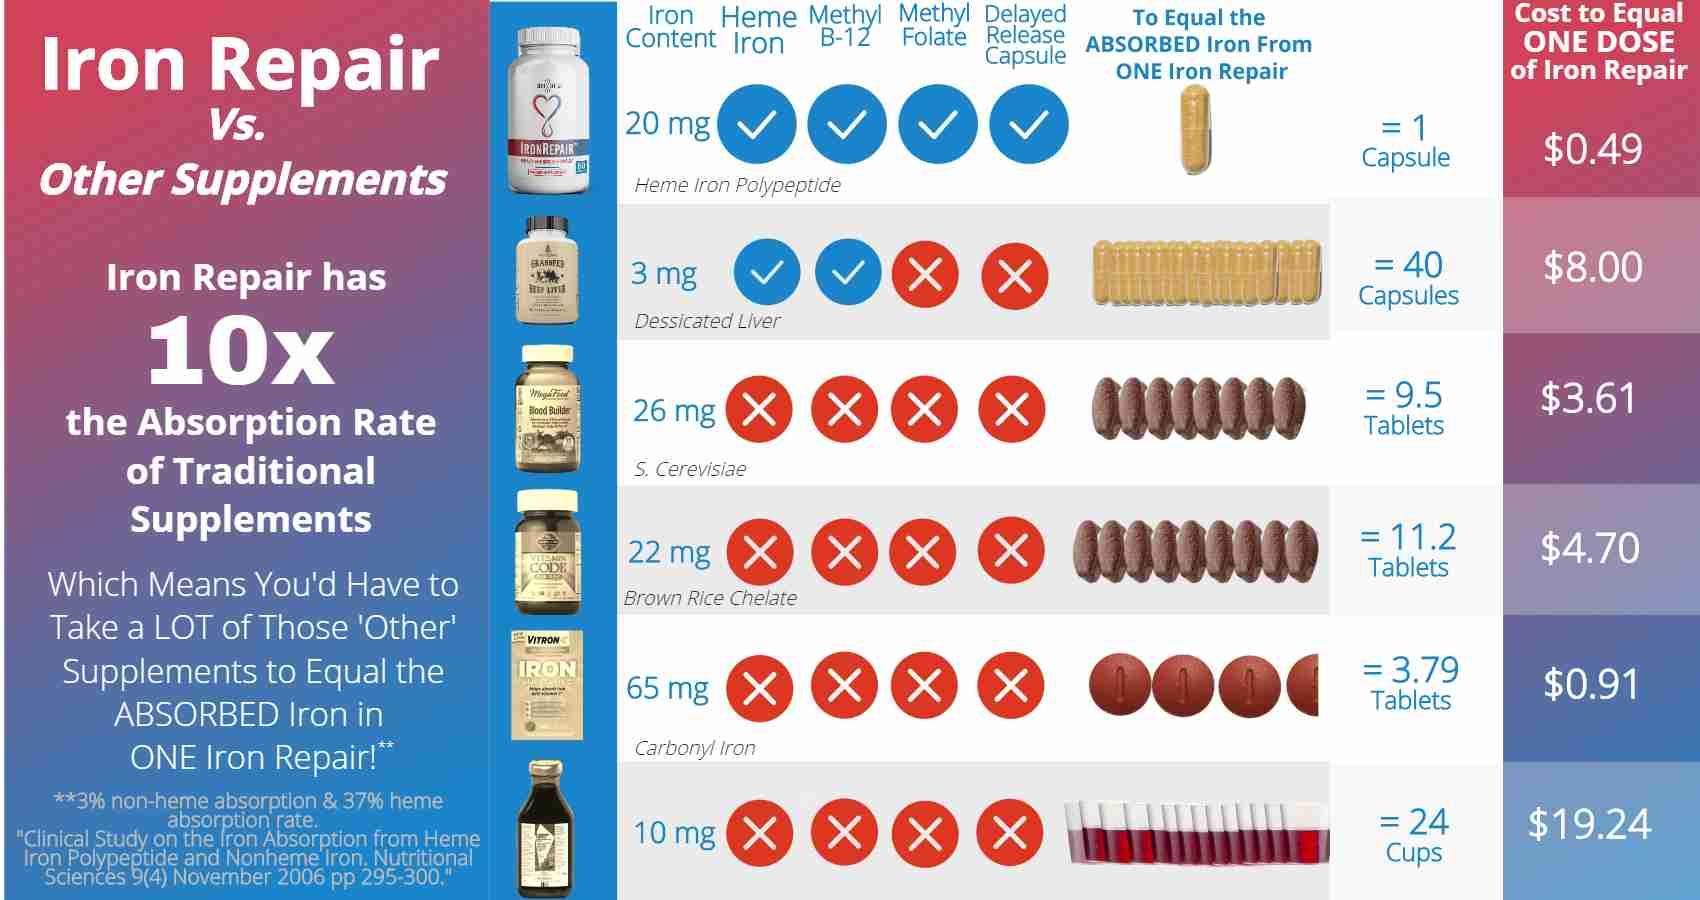 Iron Repair best natural iron supplement no fillers